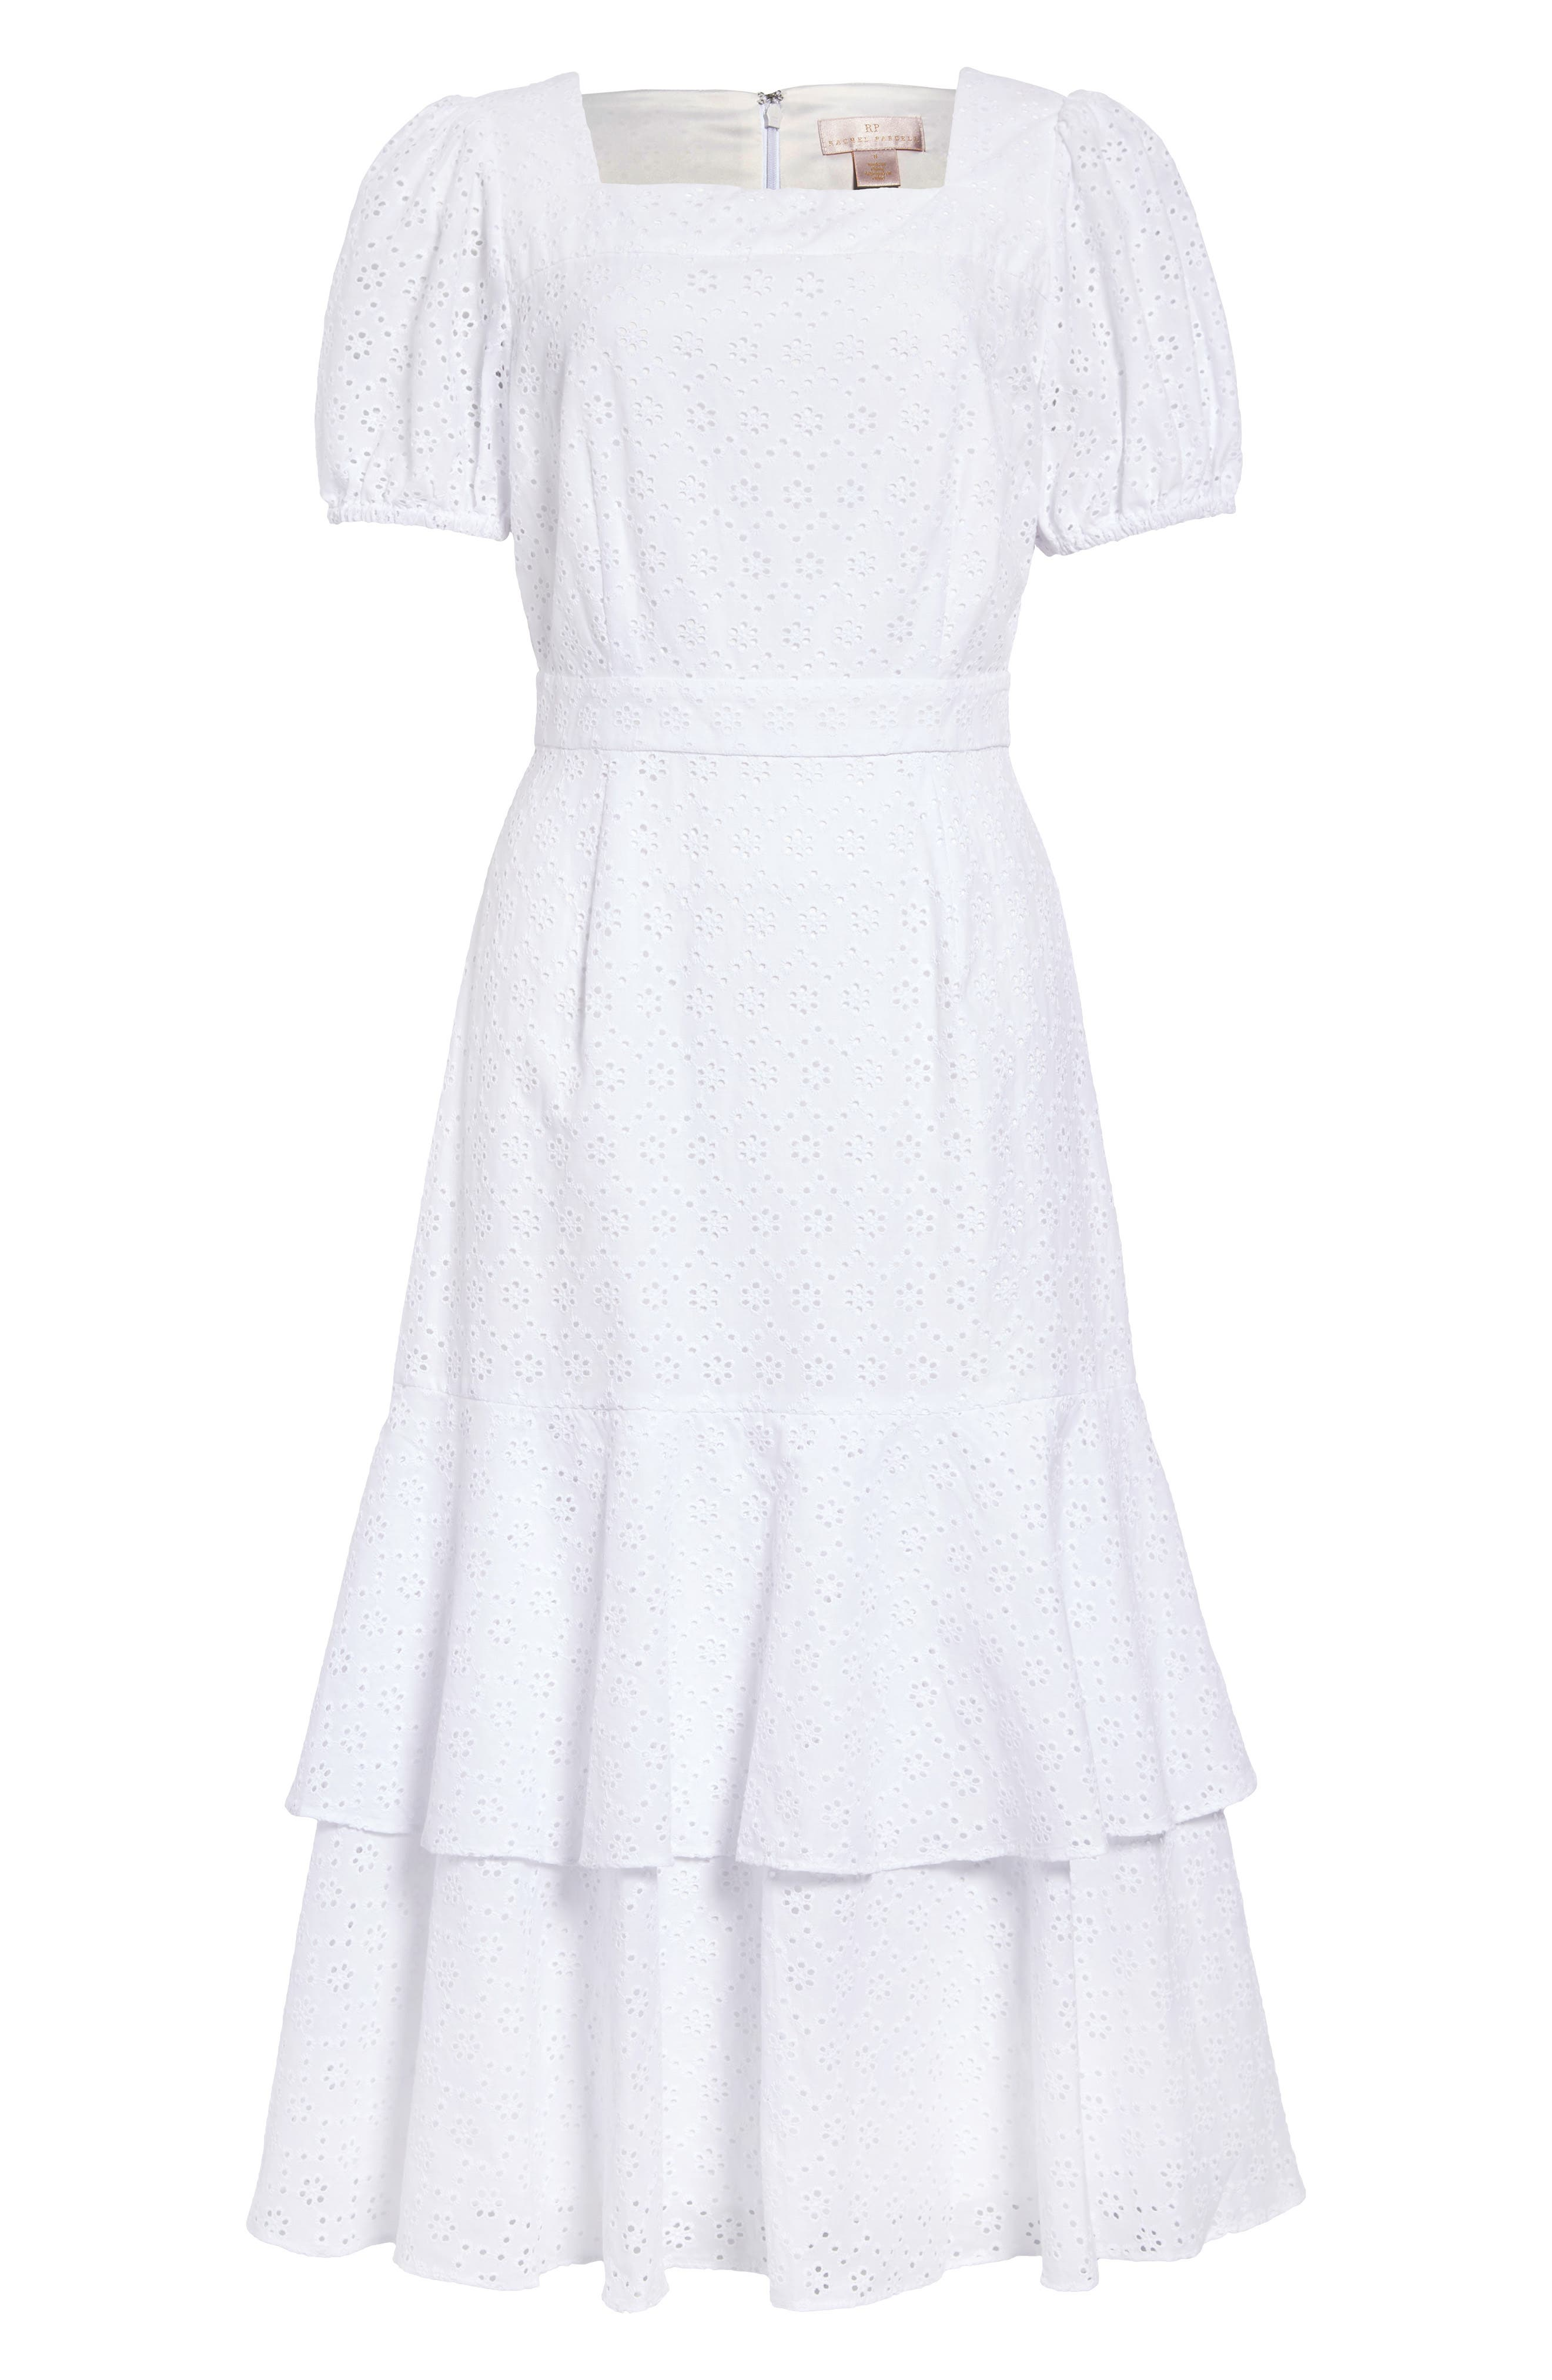 Vintage Tea Dresses, Floral Tea Dresses, Tea Length Dresses Womens Rachel Parcell Tiered Eyelet Midi Dress Size - Nordstrom Exclusive $104.30 AT vintagedancer.com